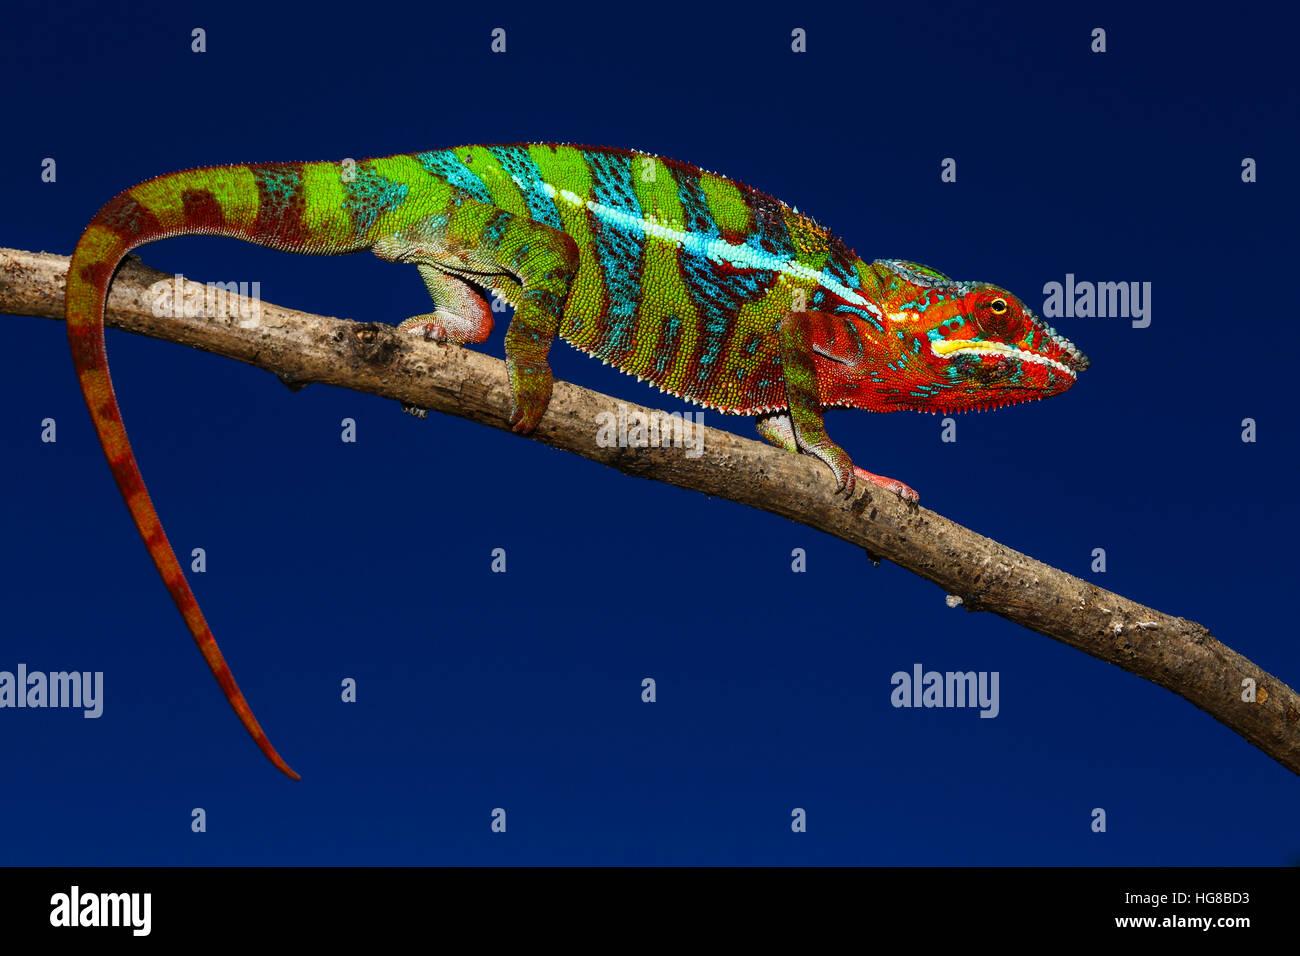 Männliche Pantherchamäleon (Furcifer Pardalis) auf Ast, Ambilobe, Diana, Madagaskar Stockbild